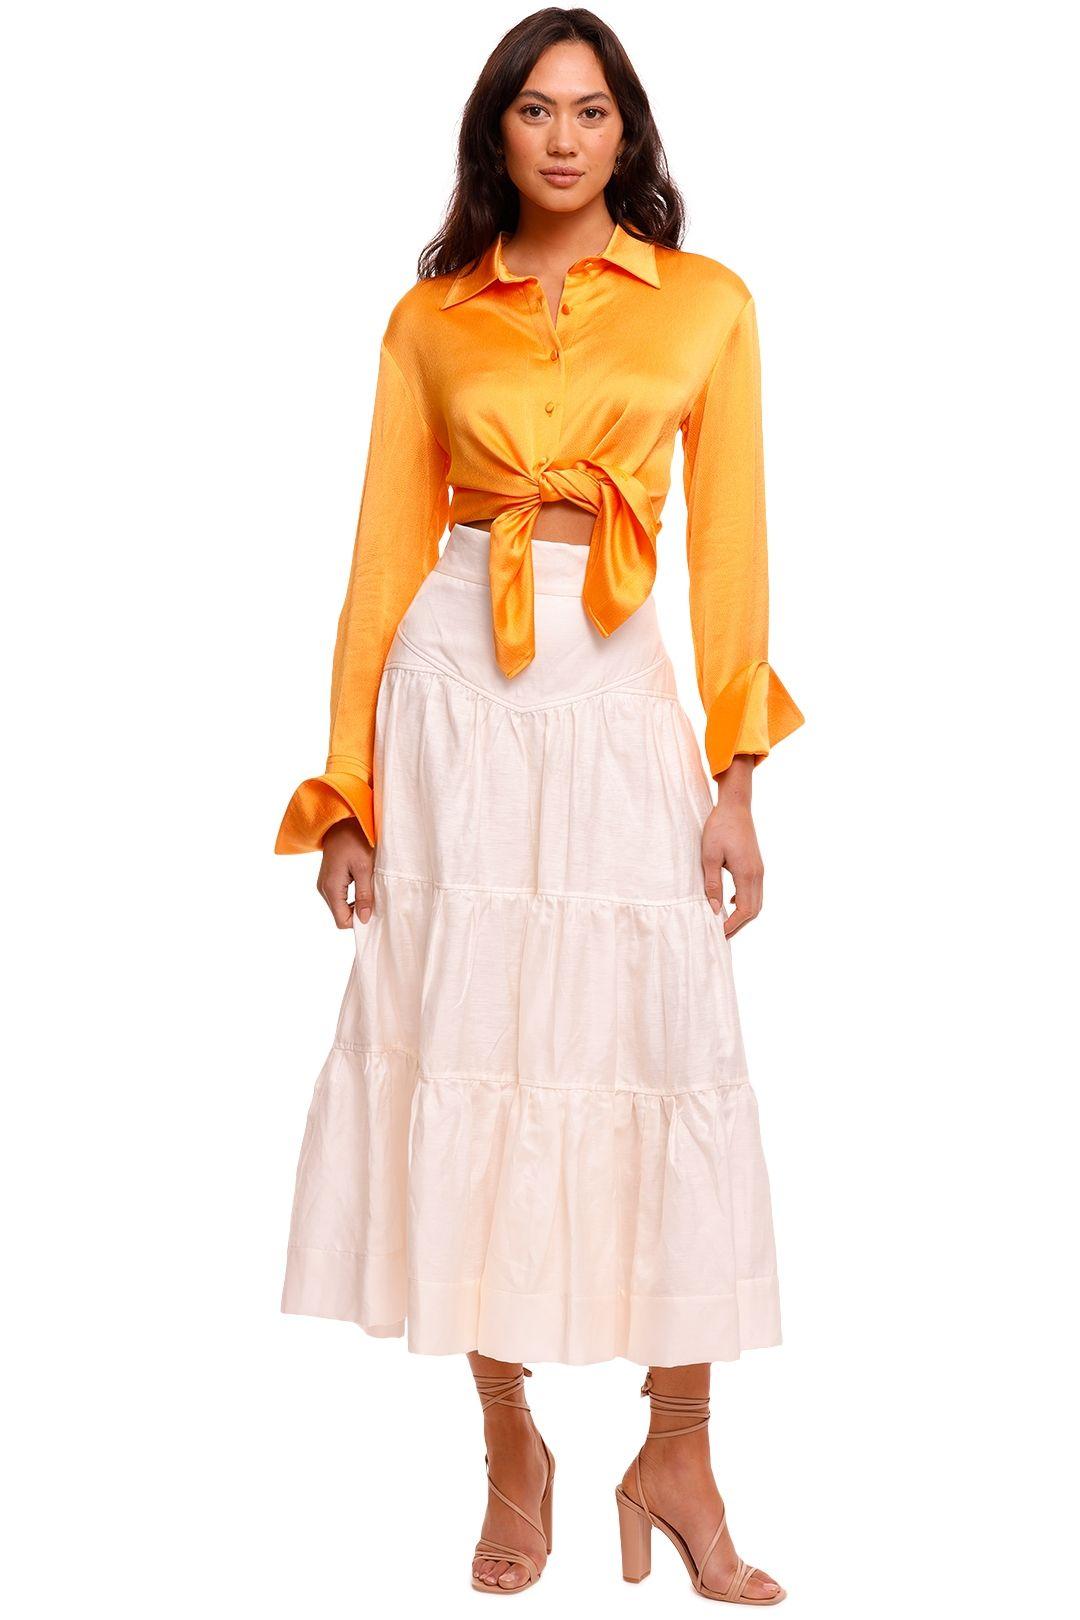 Shona Joy Tiered Midi Skirt cream